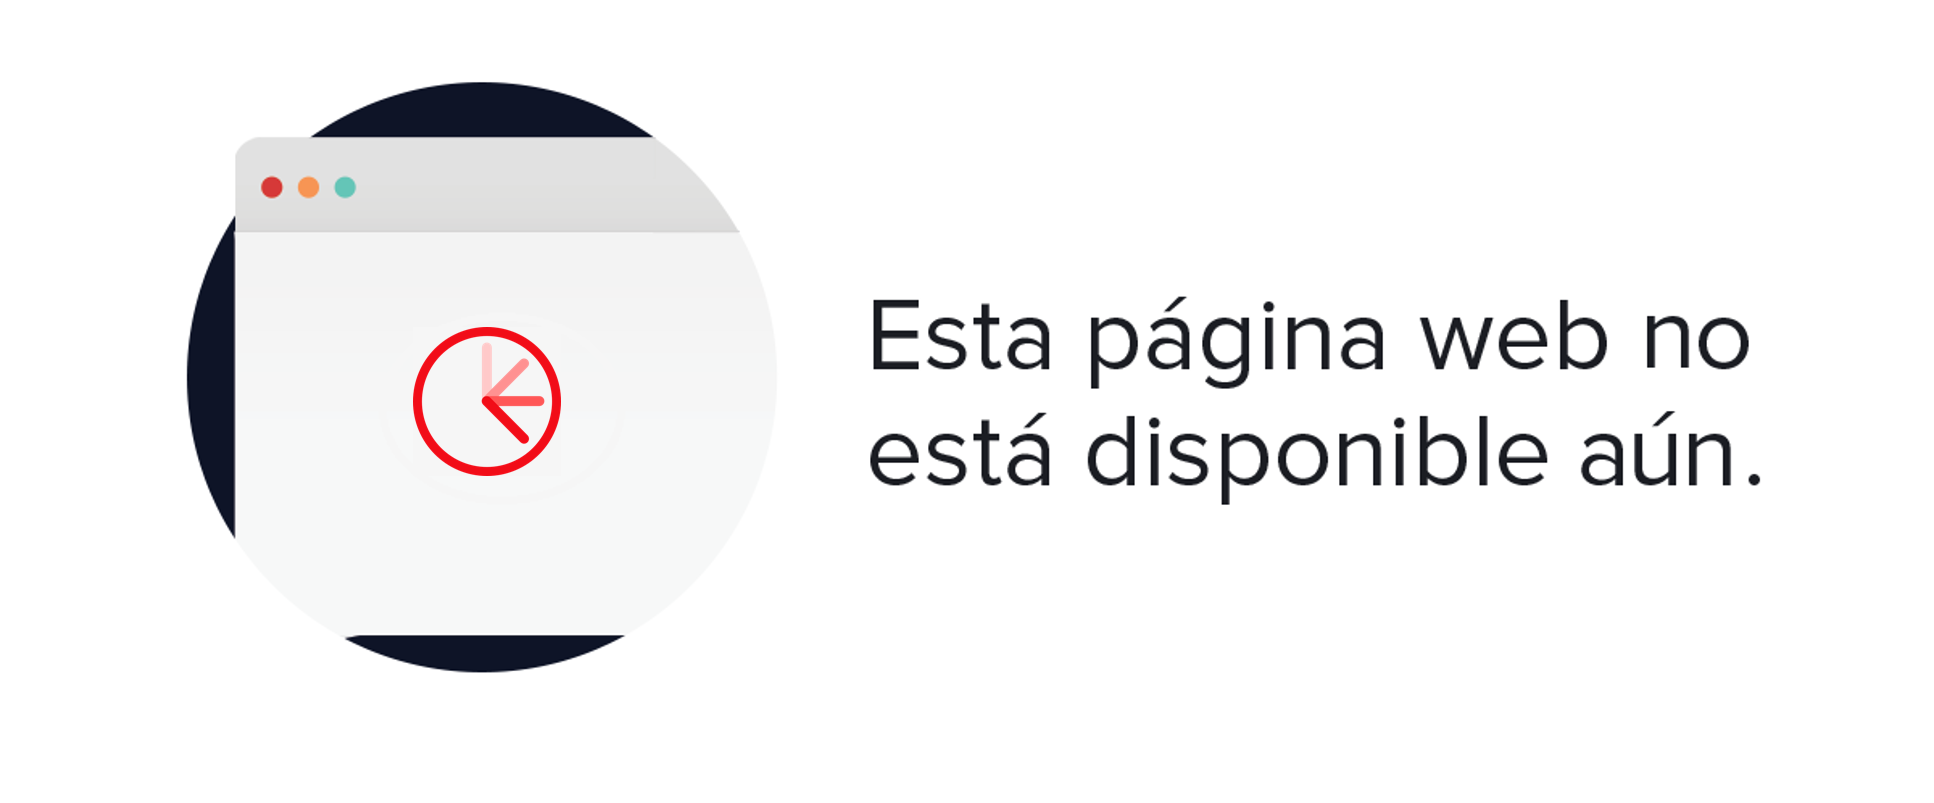 vizcaya guipuzcoa: